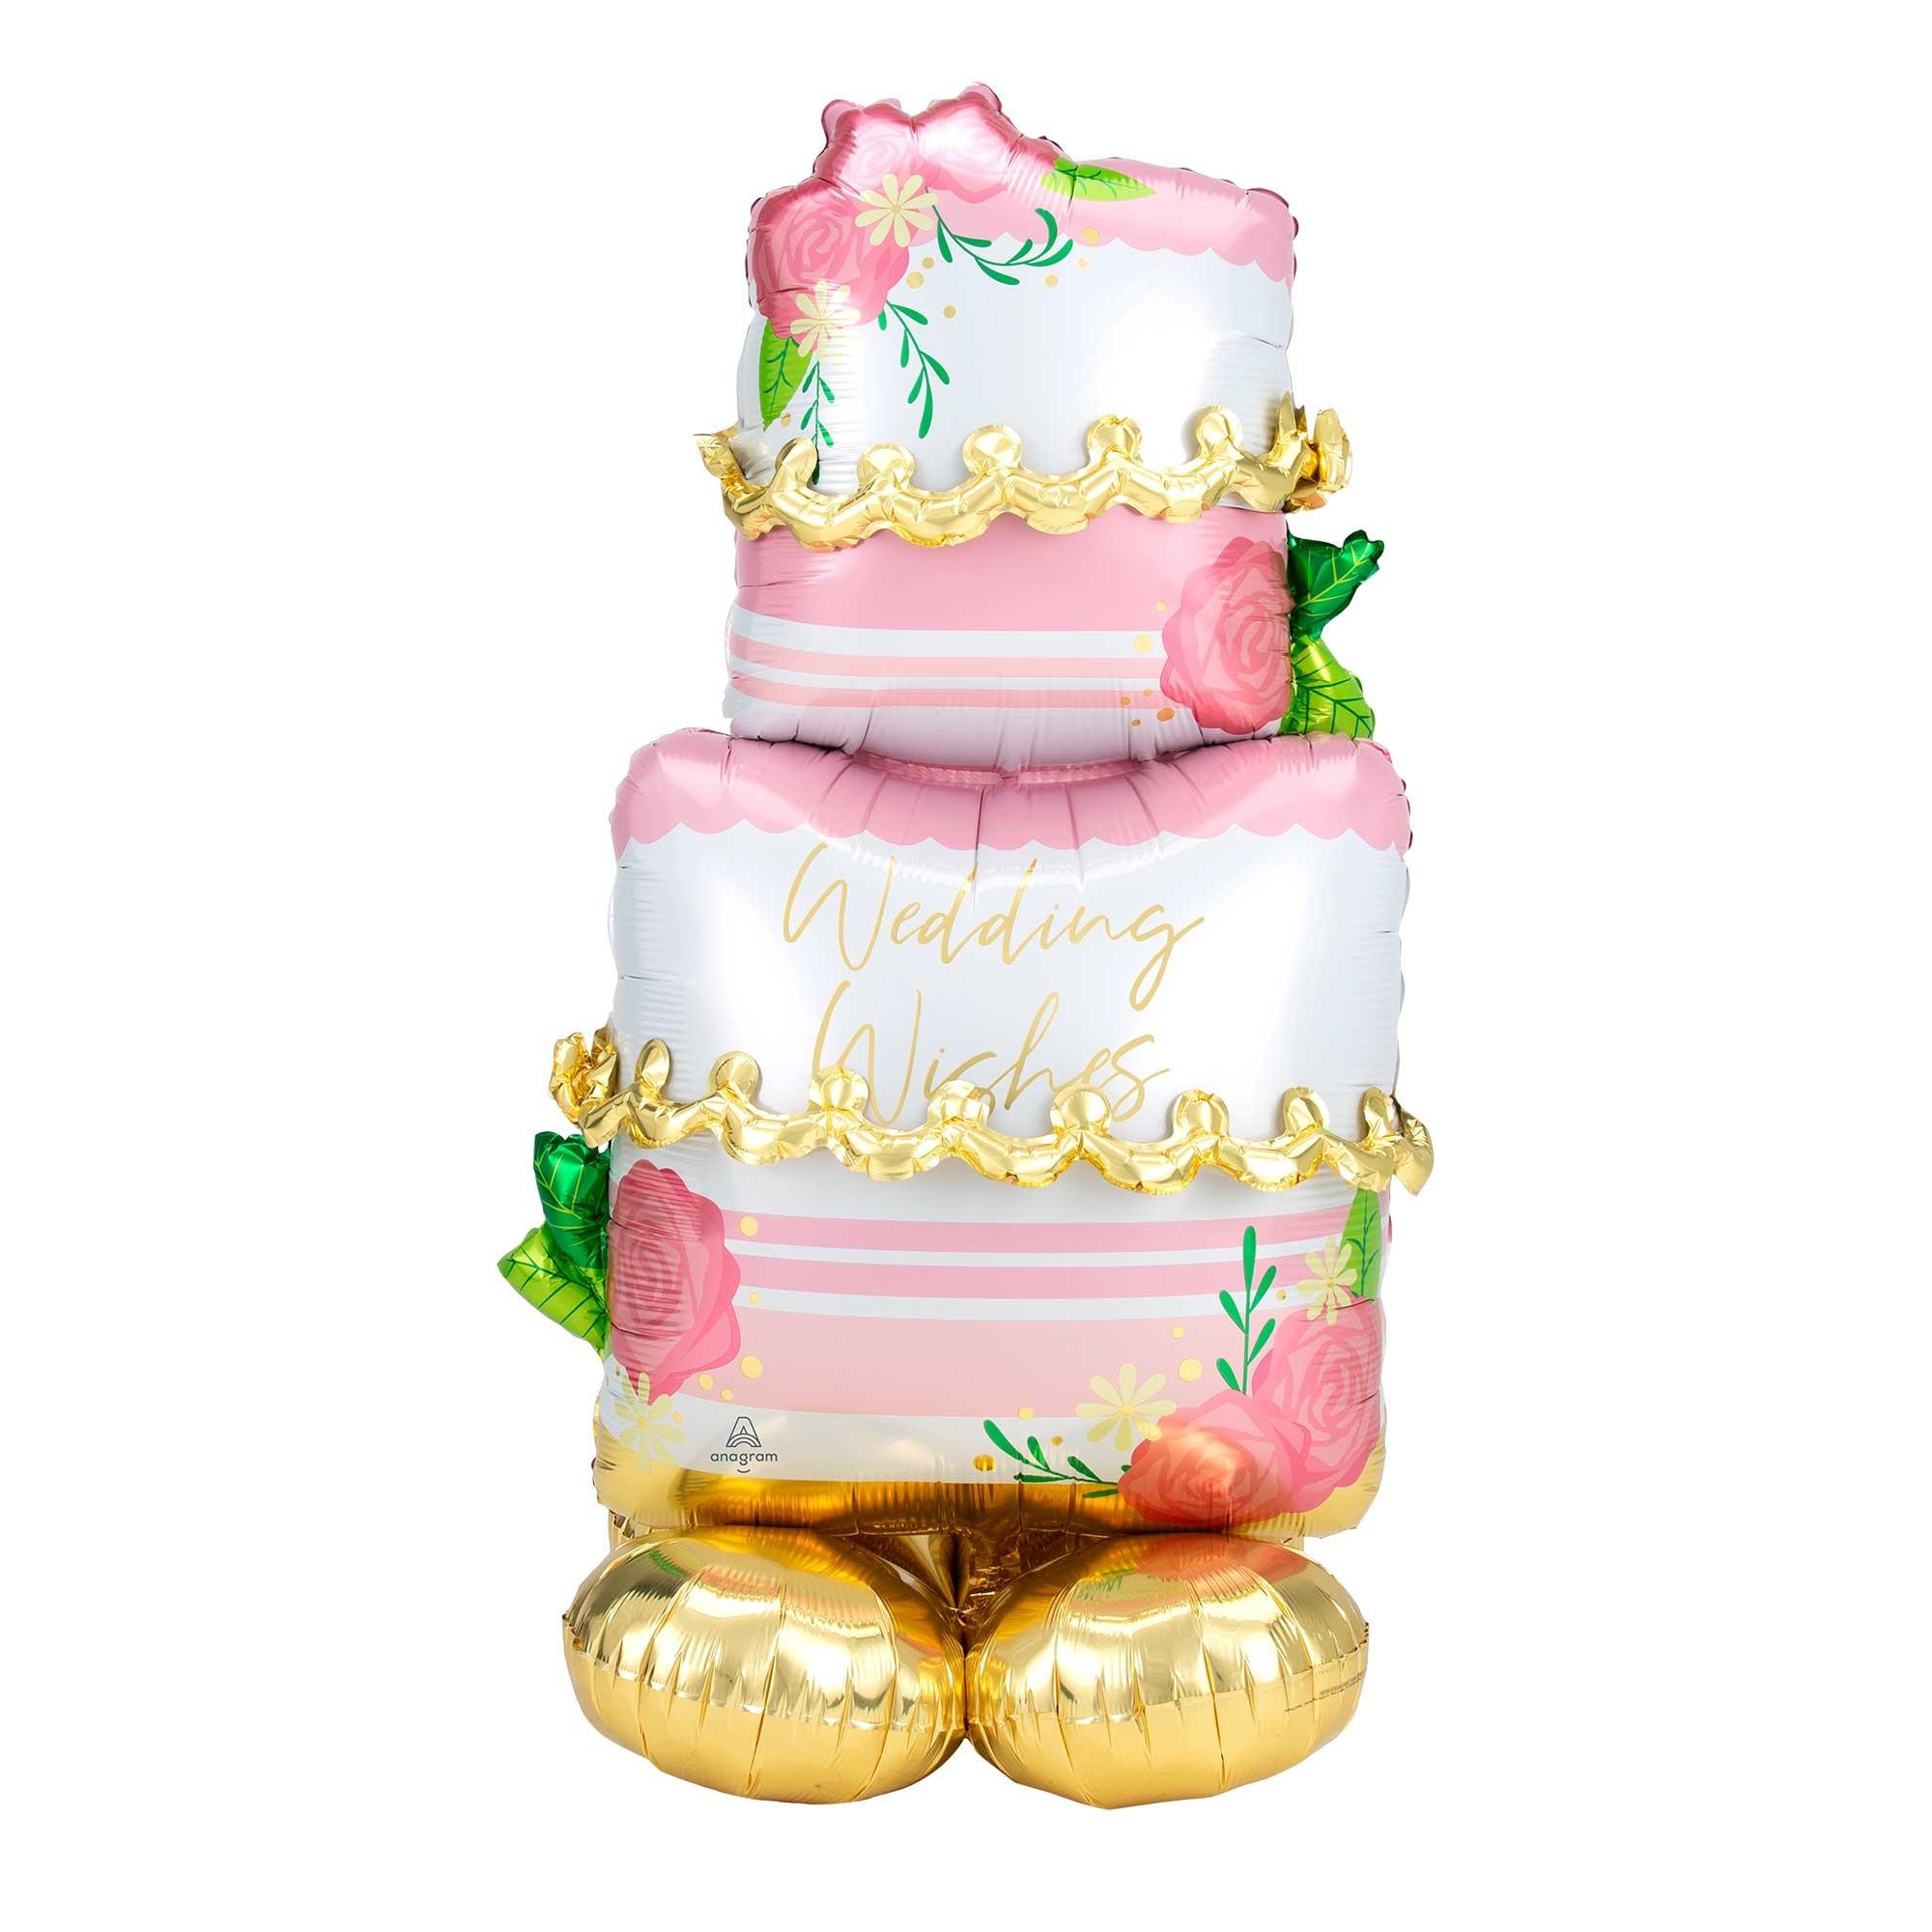 CI: AirLoonz Wedding Wishes Cake P70